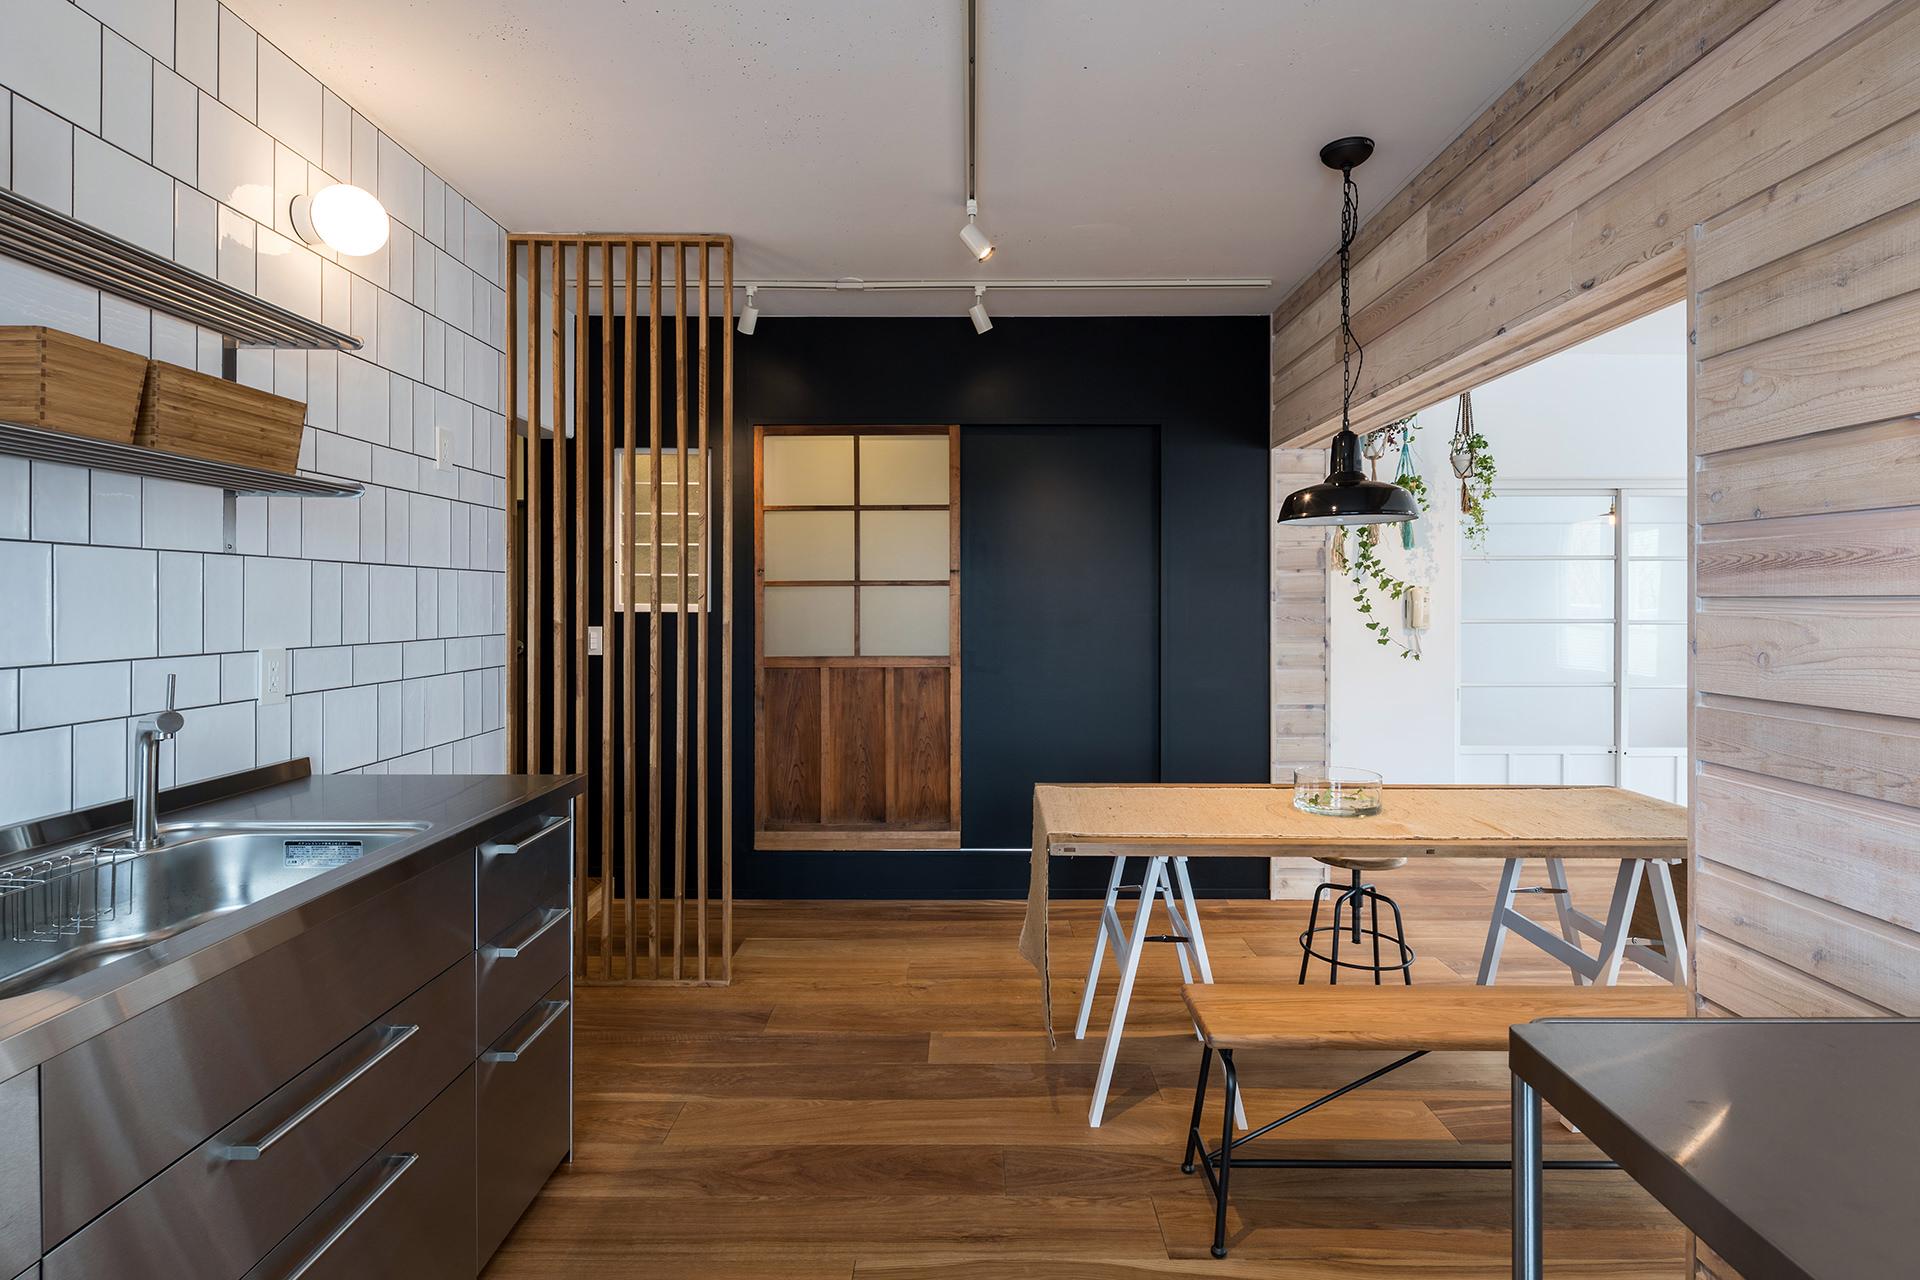 「stri-ep house flat ジュネス葉山一色ガーデン」  イメージ07 撮影:東涌宏和